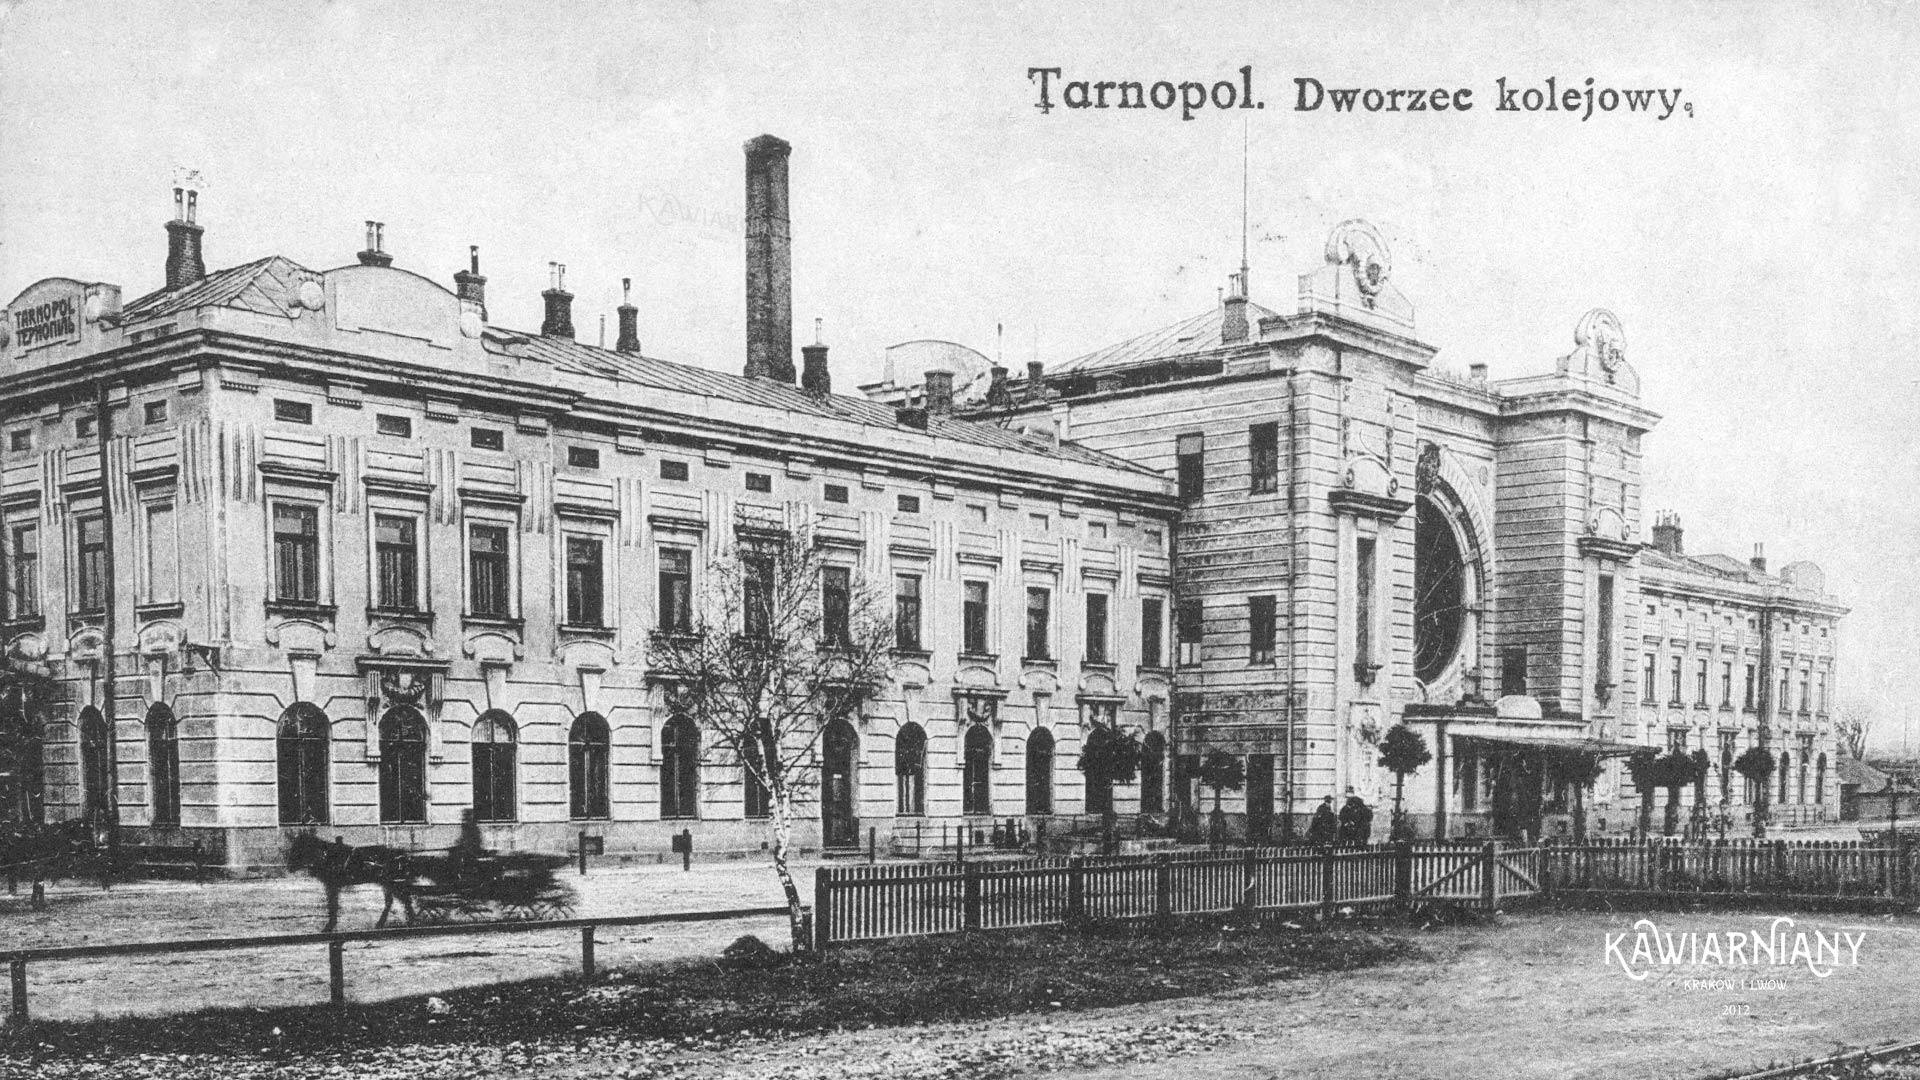 Dworzec, Tarnopol